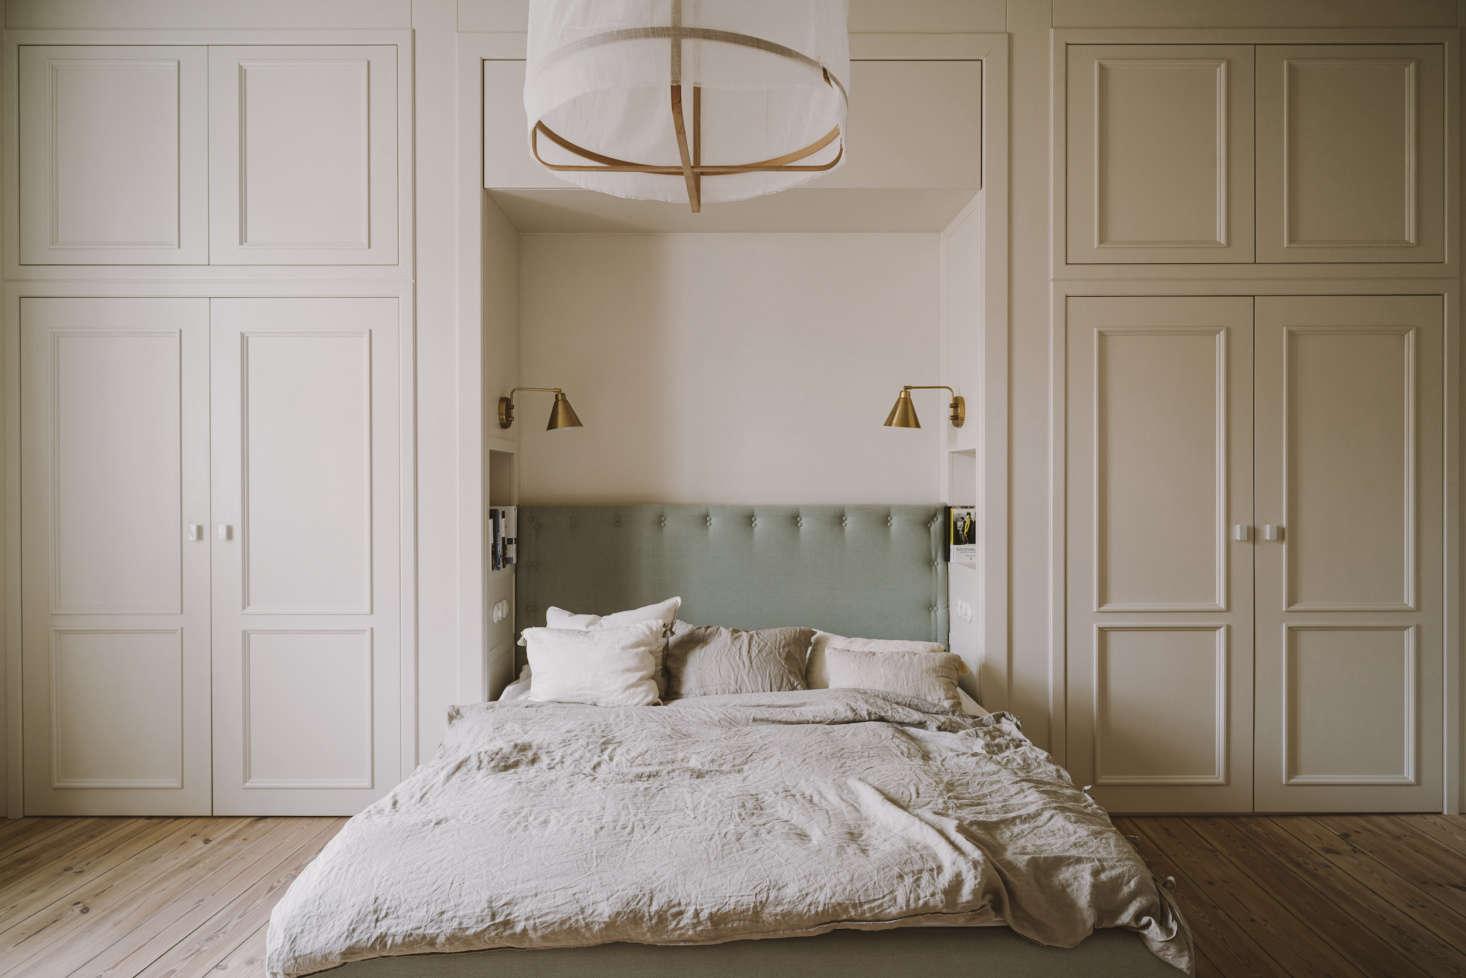 Chrapka designed inset shelves on both sides of the bed alcove for storing books.